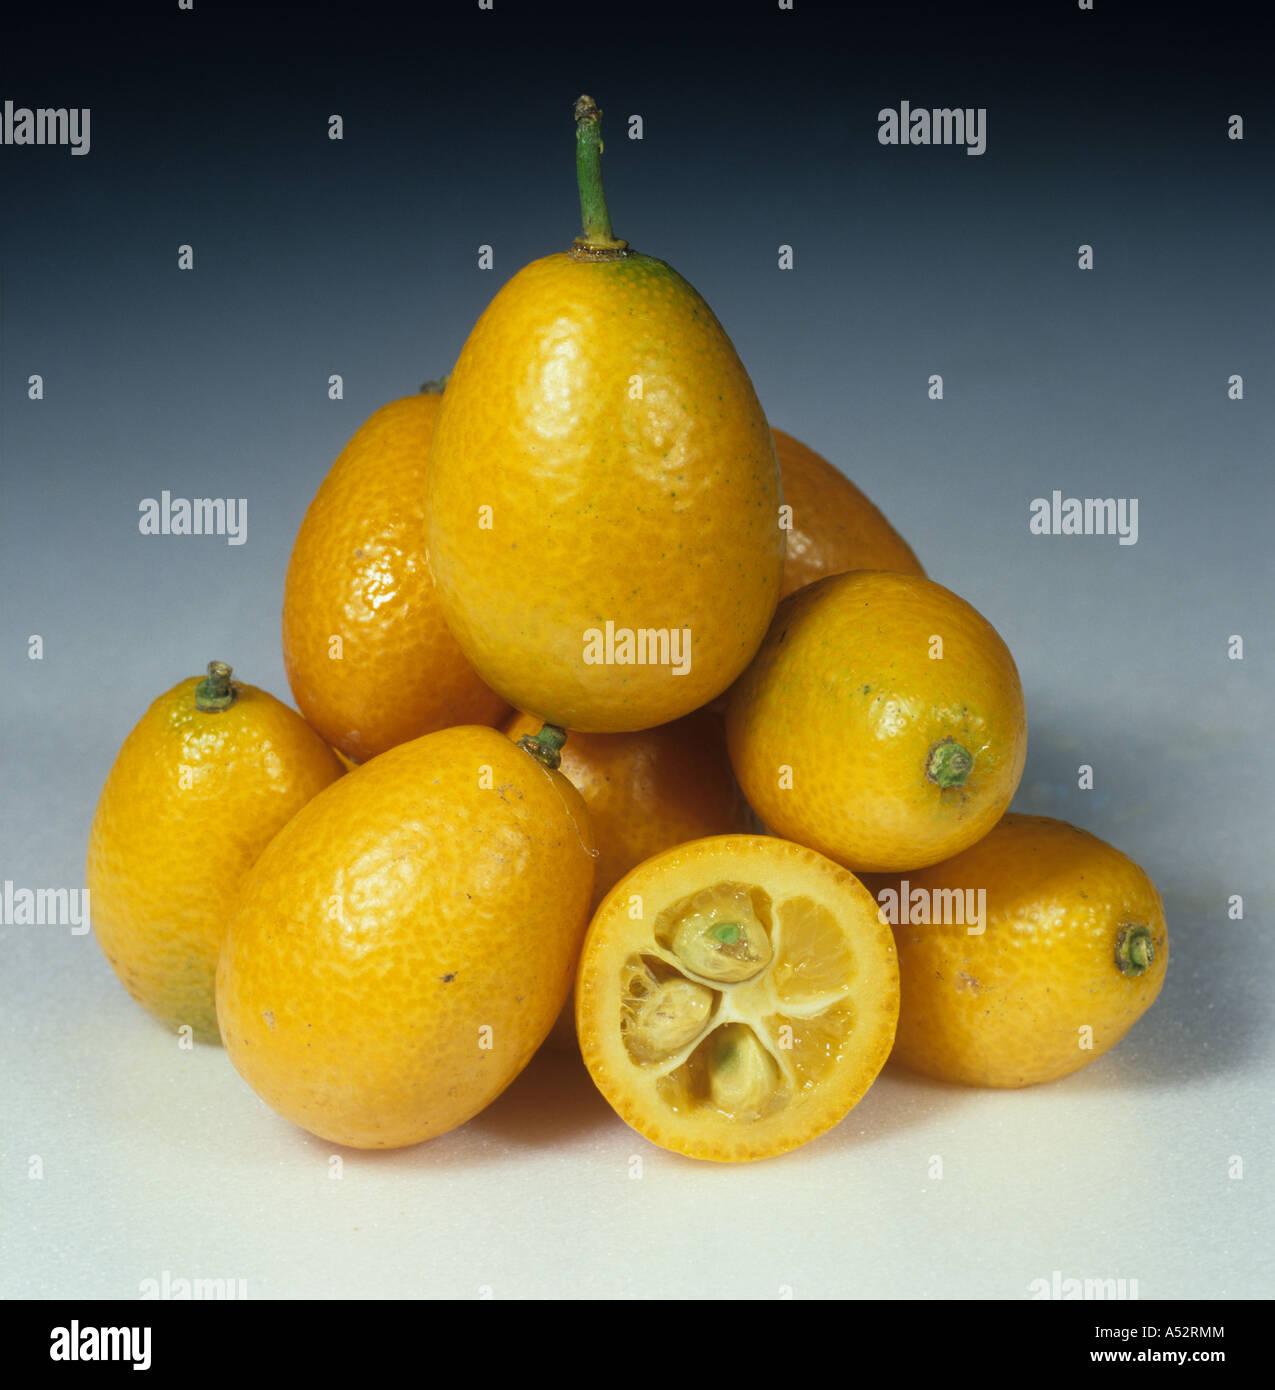 Whole and section kumquat fruit variety Oval - Stock Image